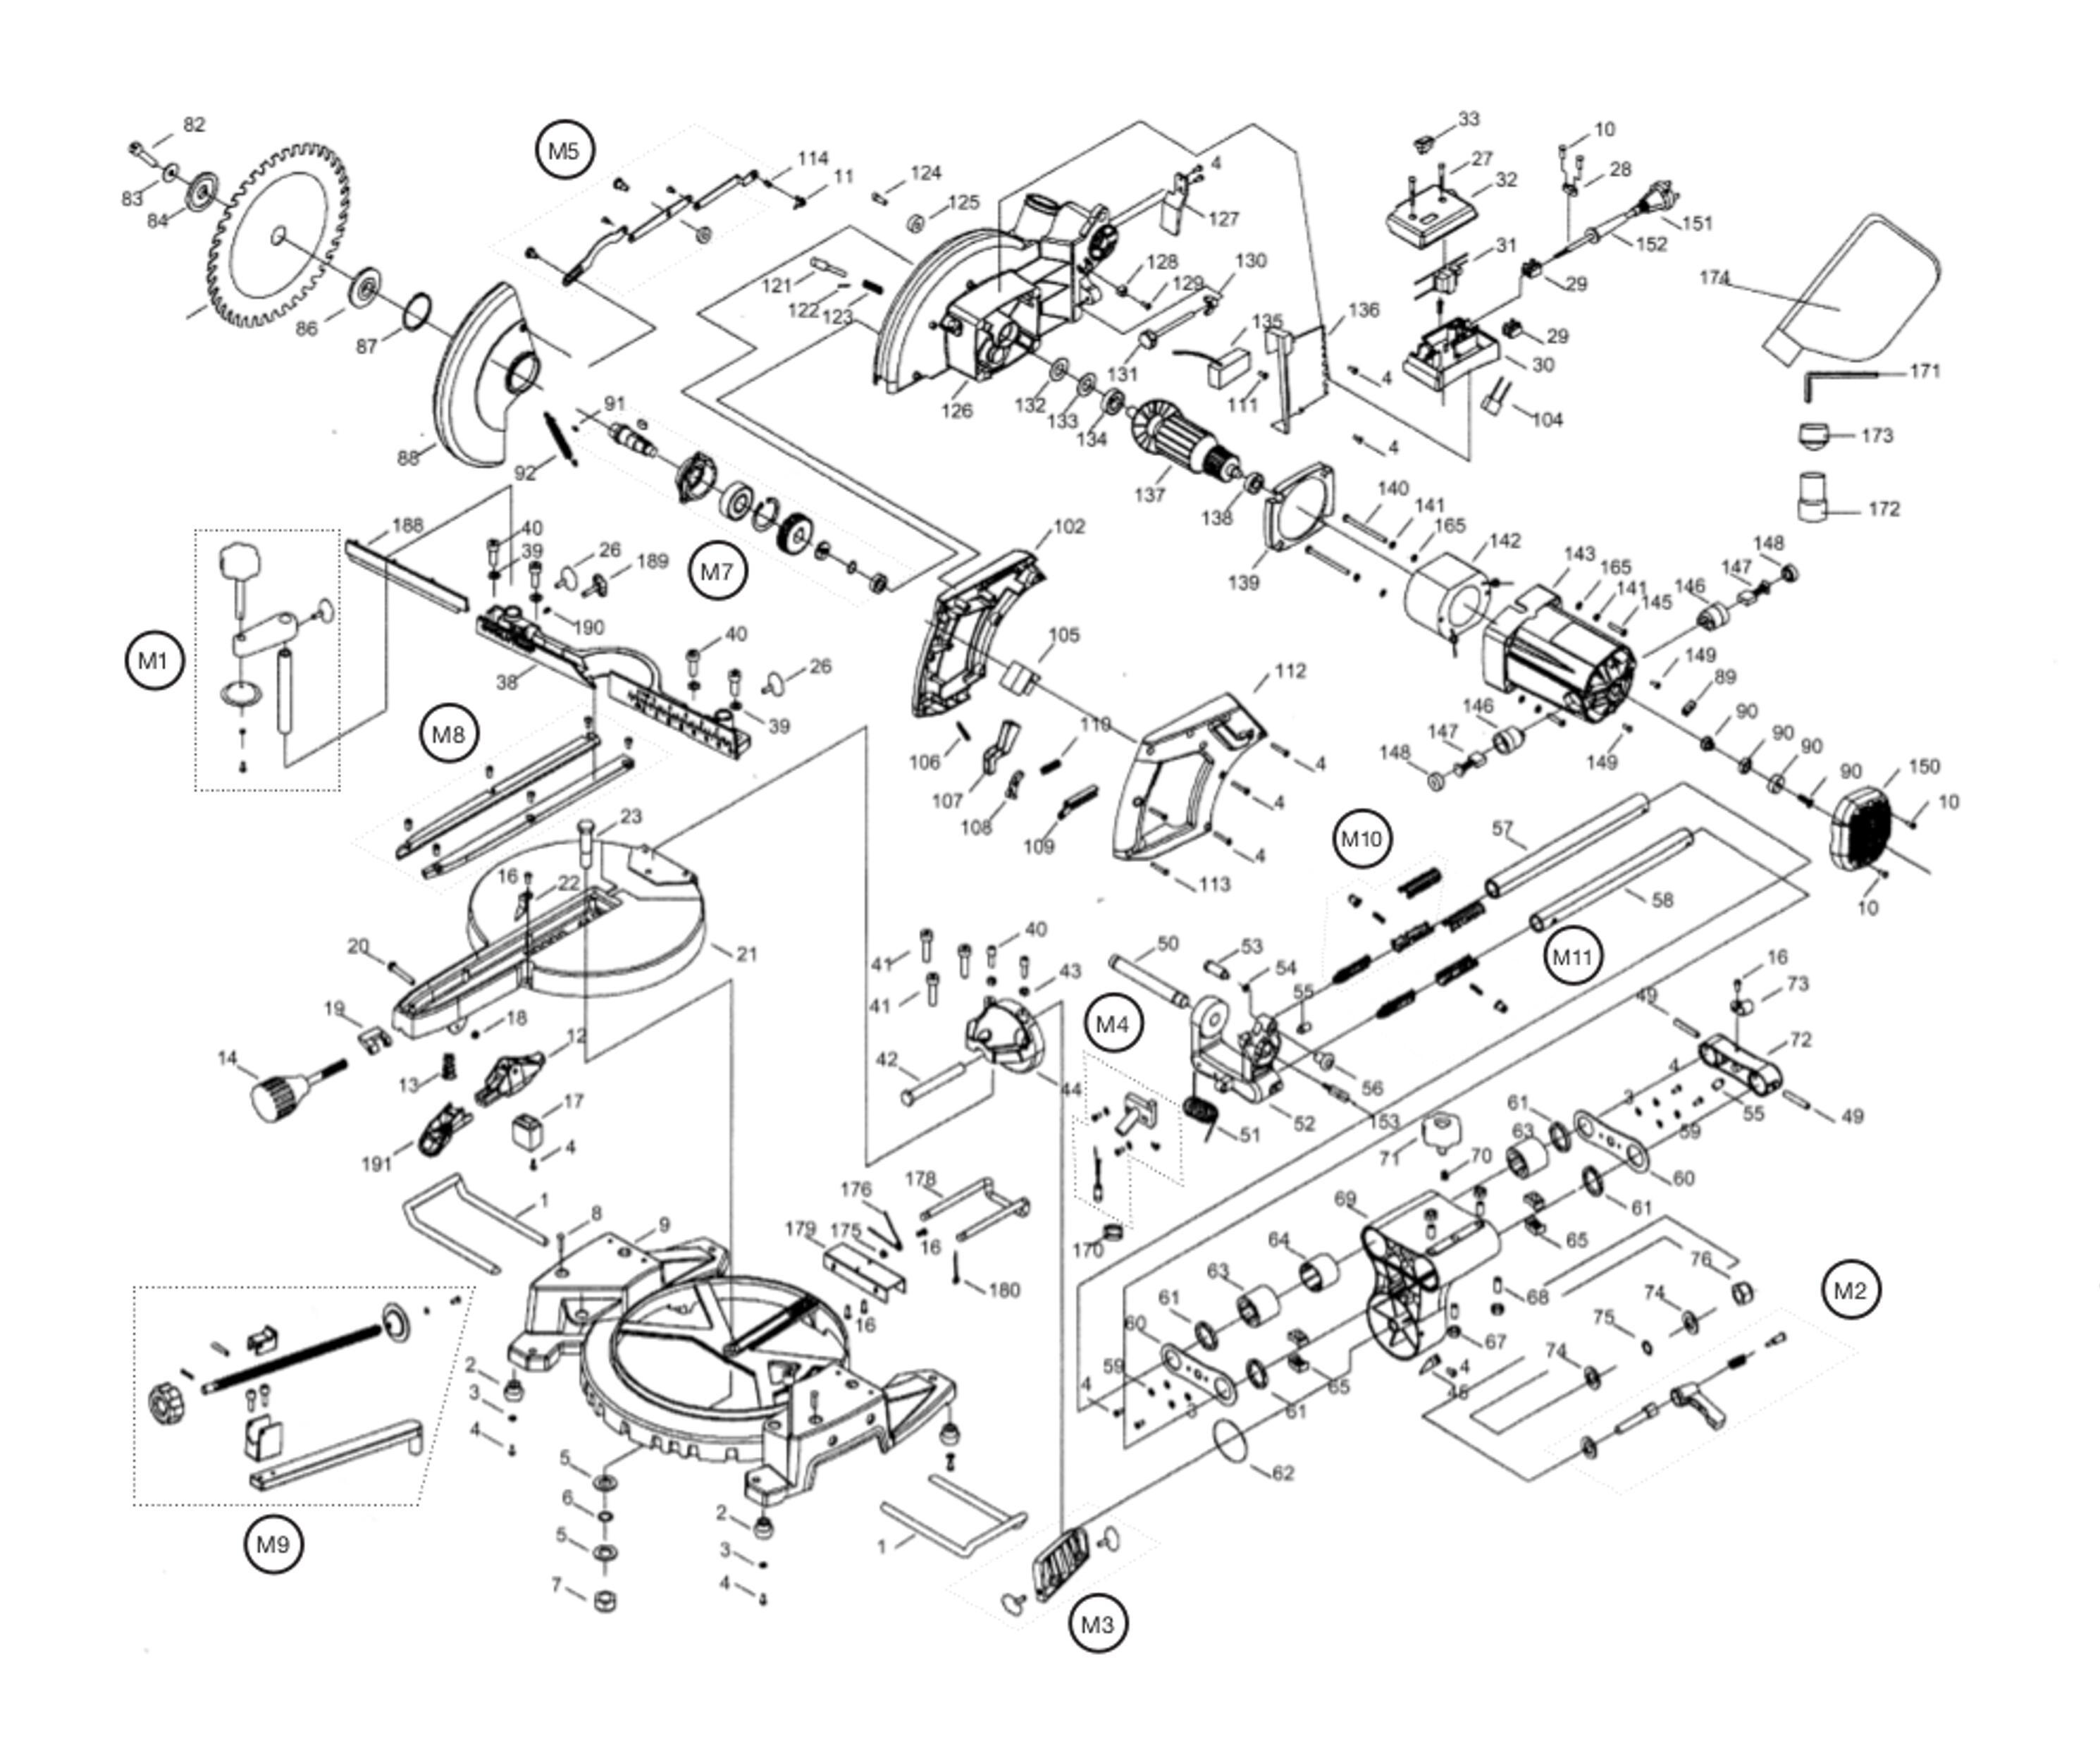 spares for evolution fury3 240v 210mm tct multupurpose